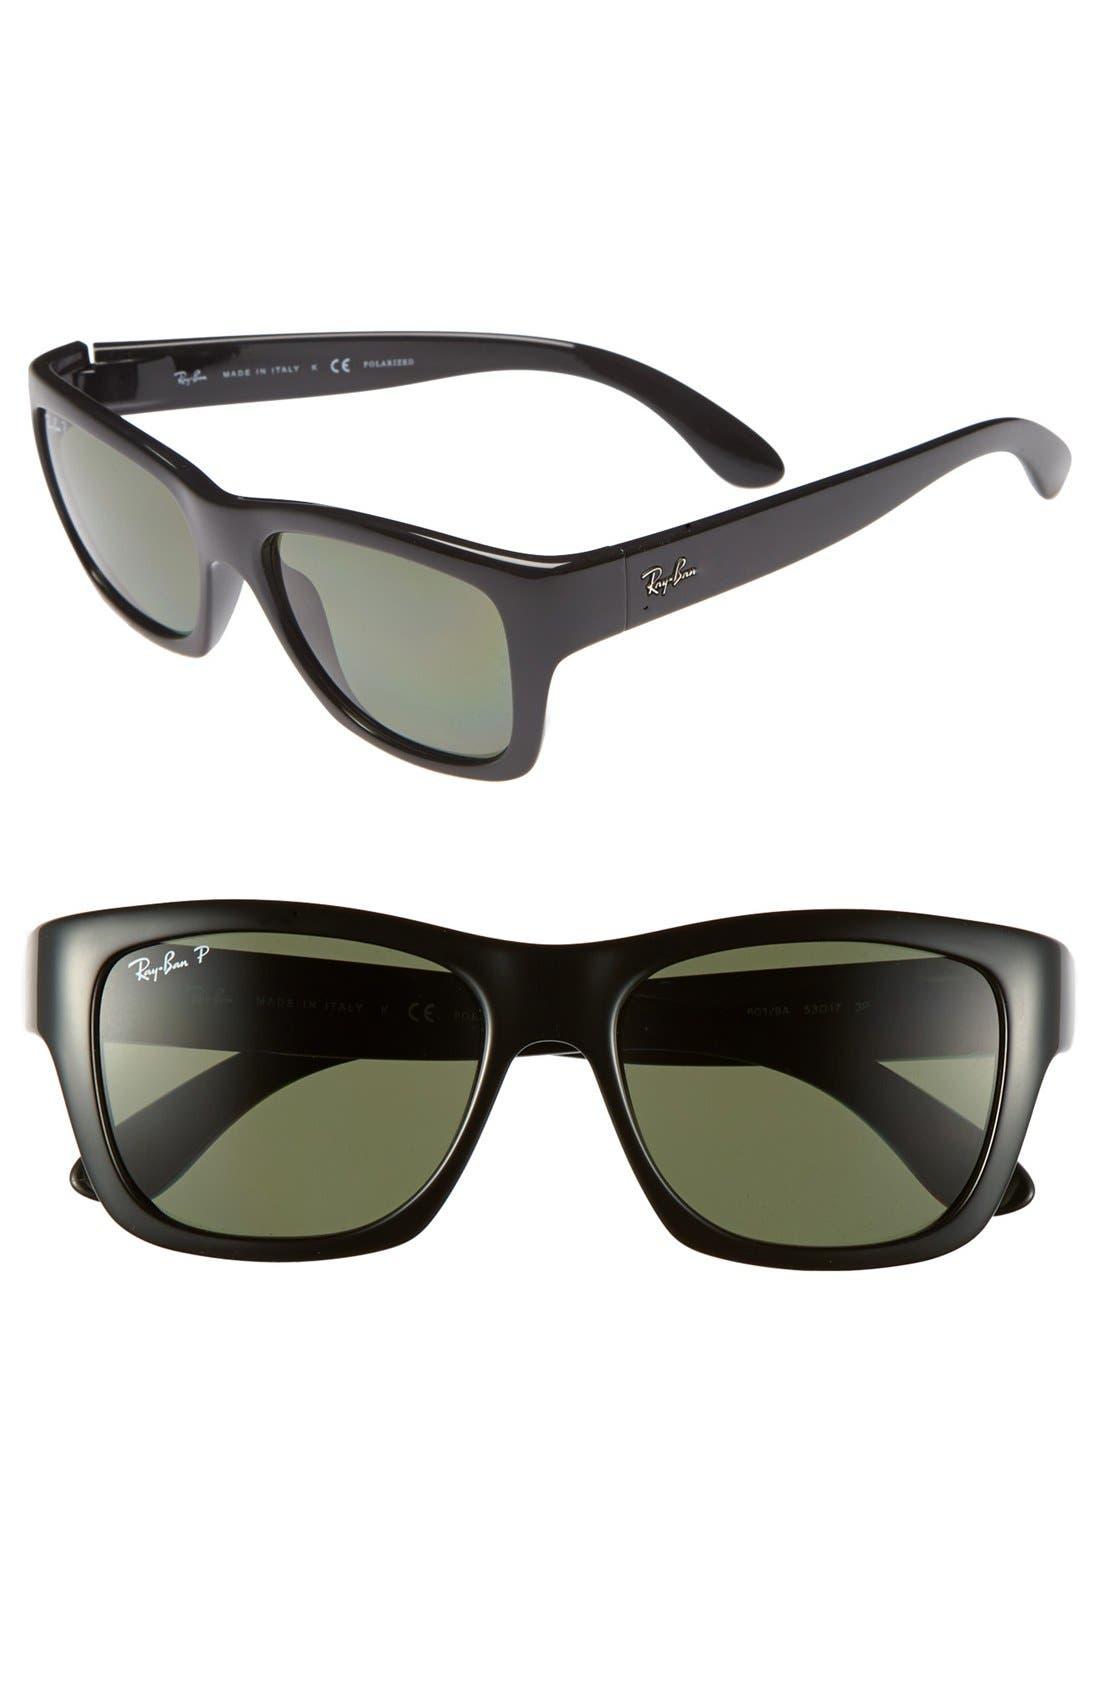 Alternate Image 1 Selected - Ray-Ban 'Square Glam' 53mm Polarized Sunglasses